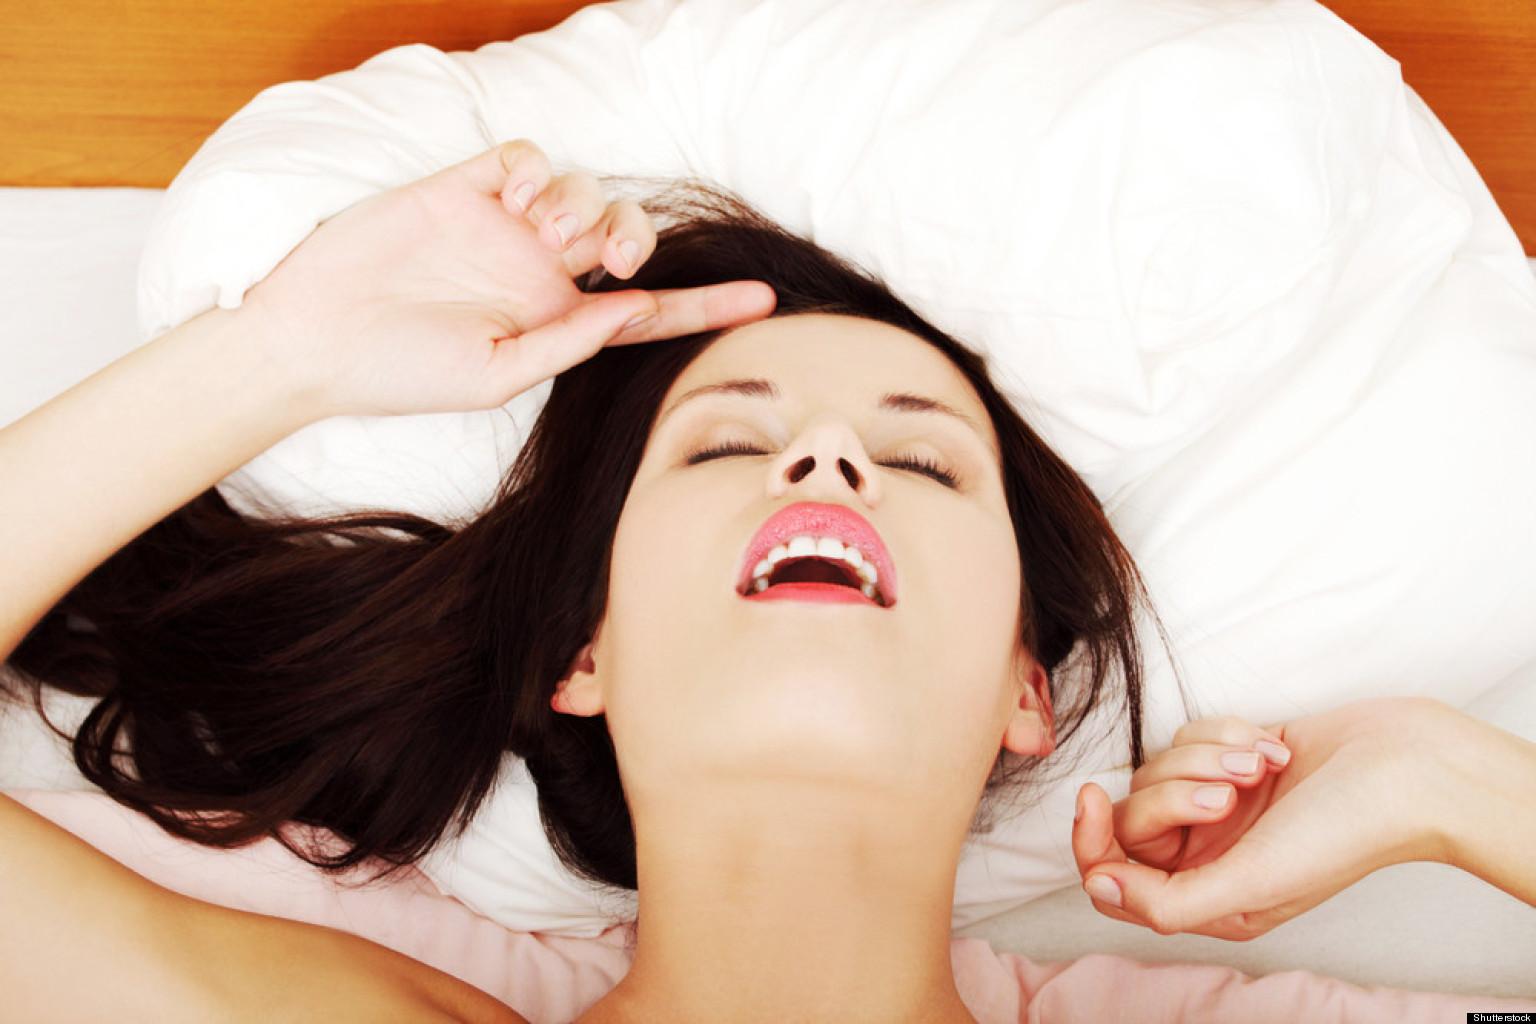 Afbeeldingsresultaat voor orgasm  woman